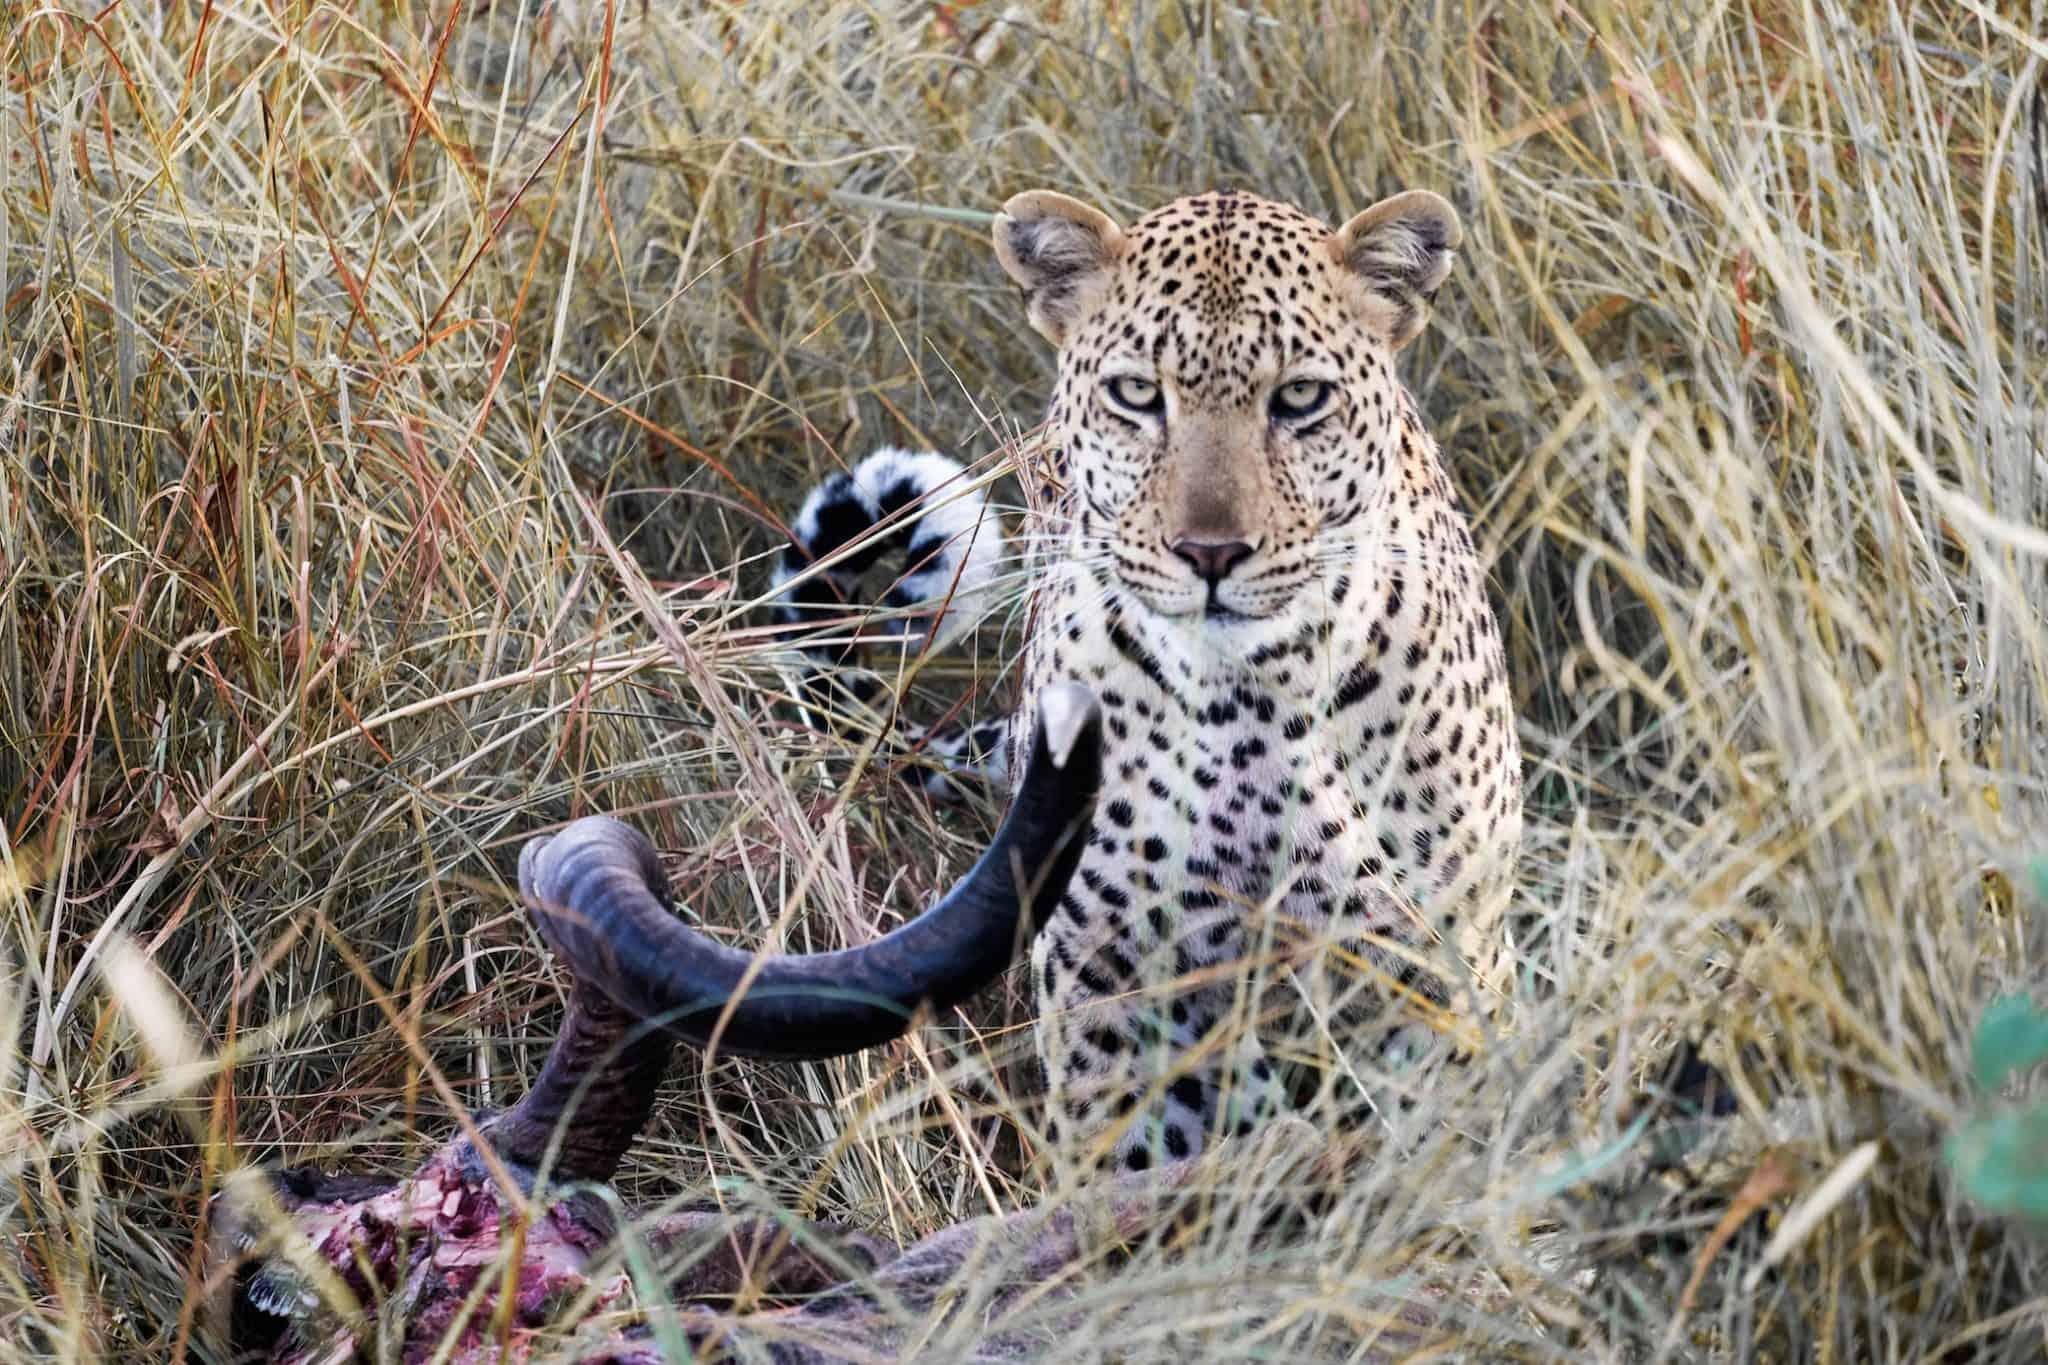 Leopards in Kafue National Park